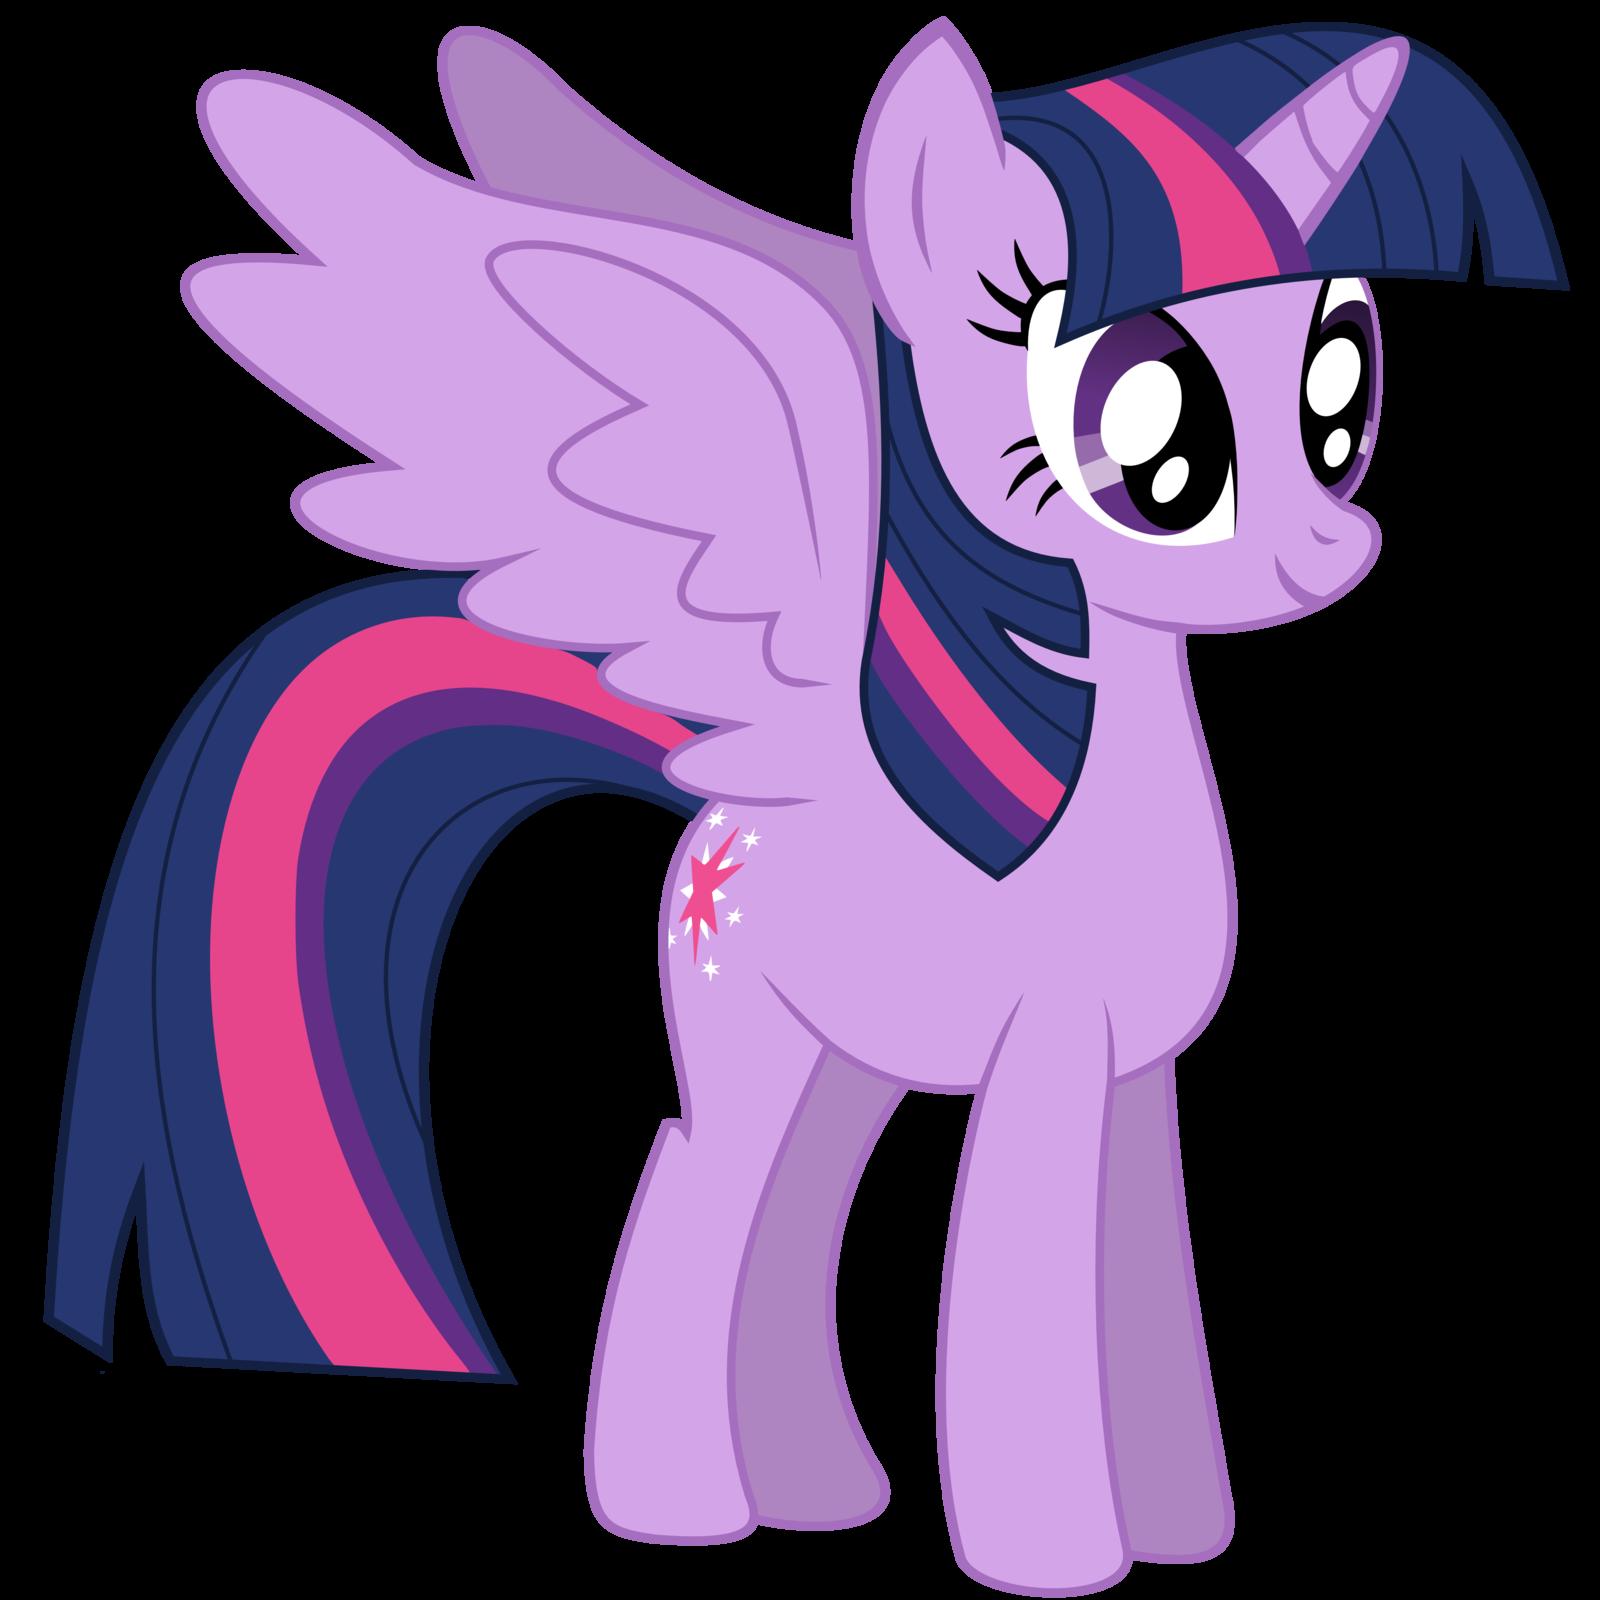 Arquivo:Request 66 Alicorn Twilight Sparkle By Radiant